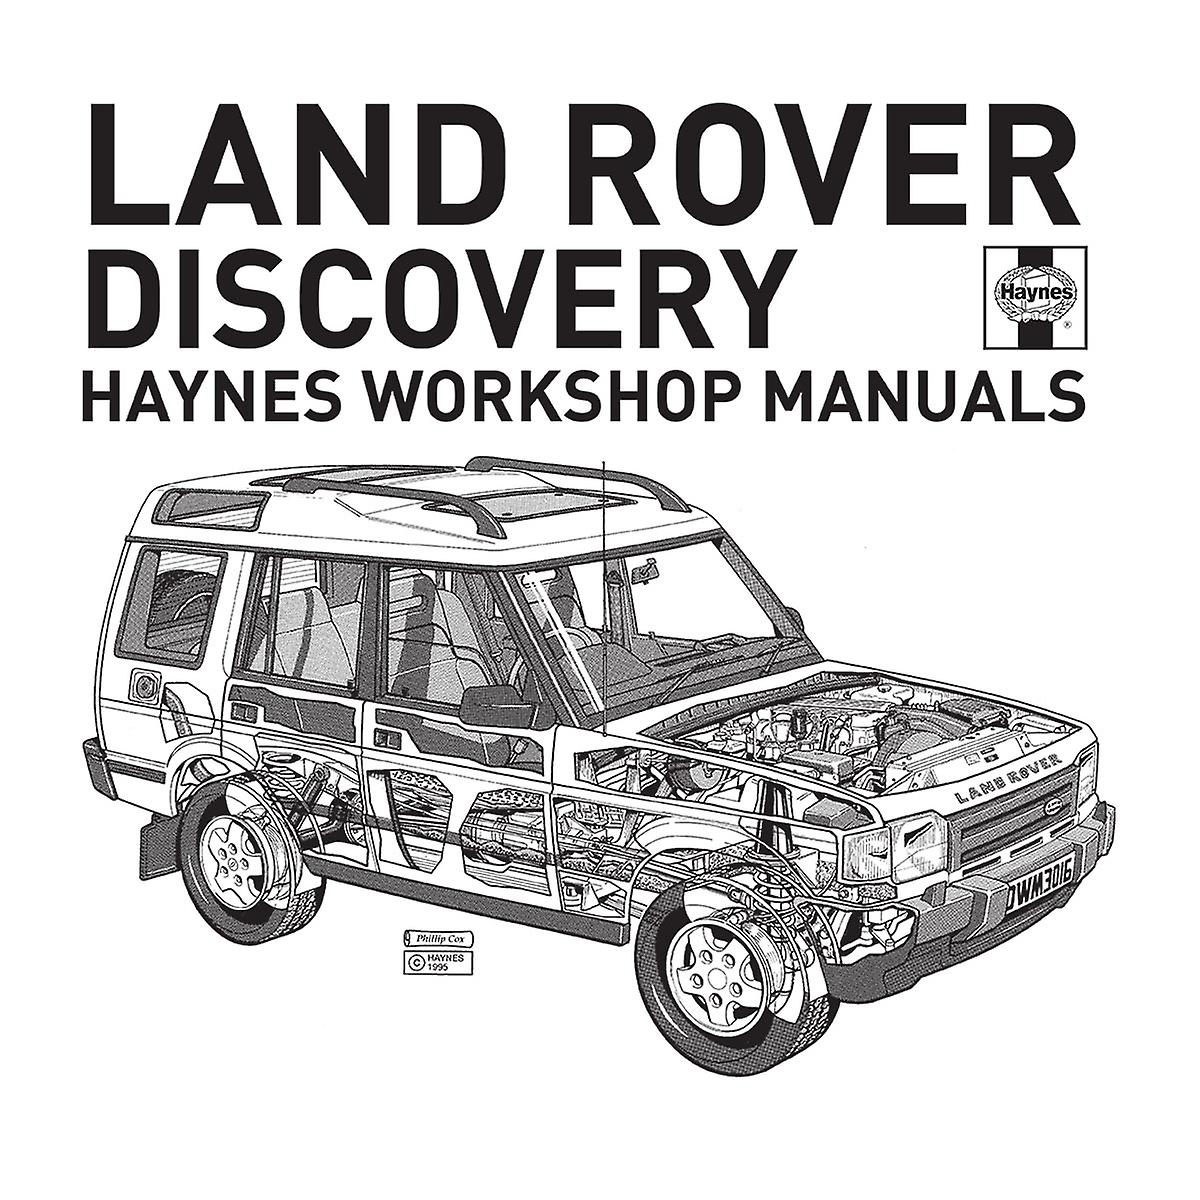 Haynes Workshop Manual Land Rover Discovery Black